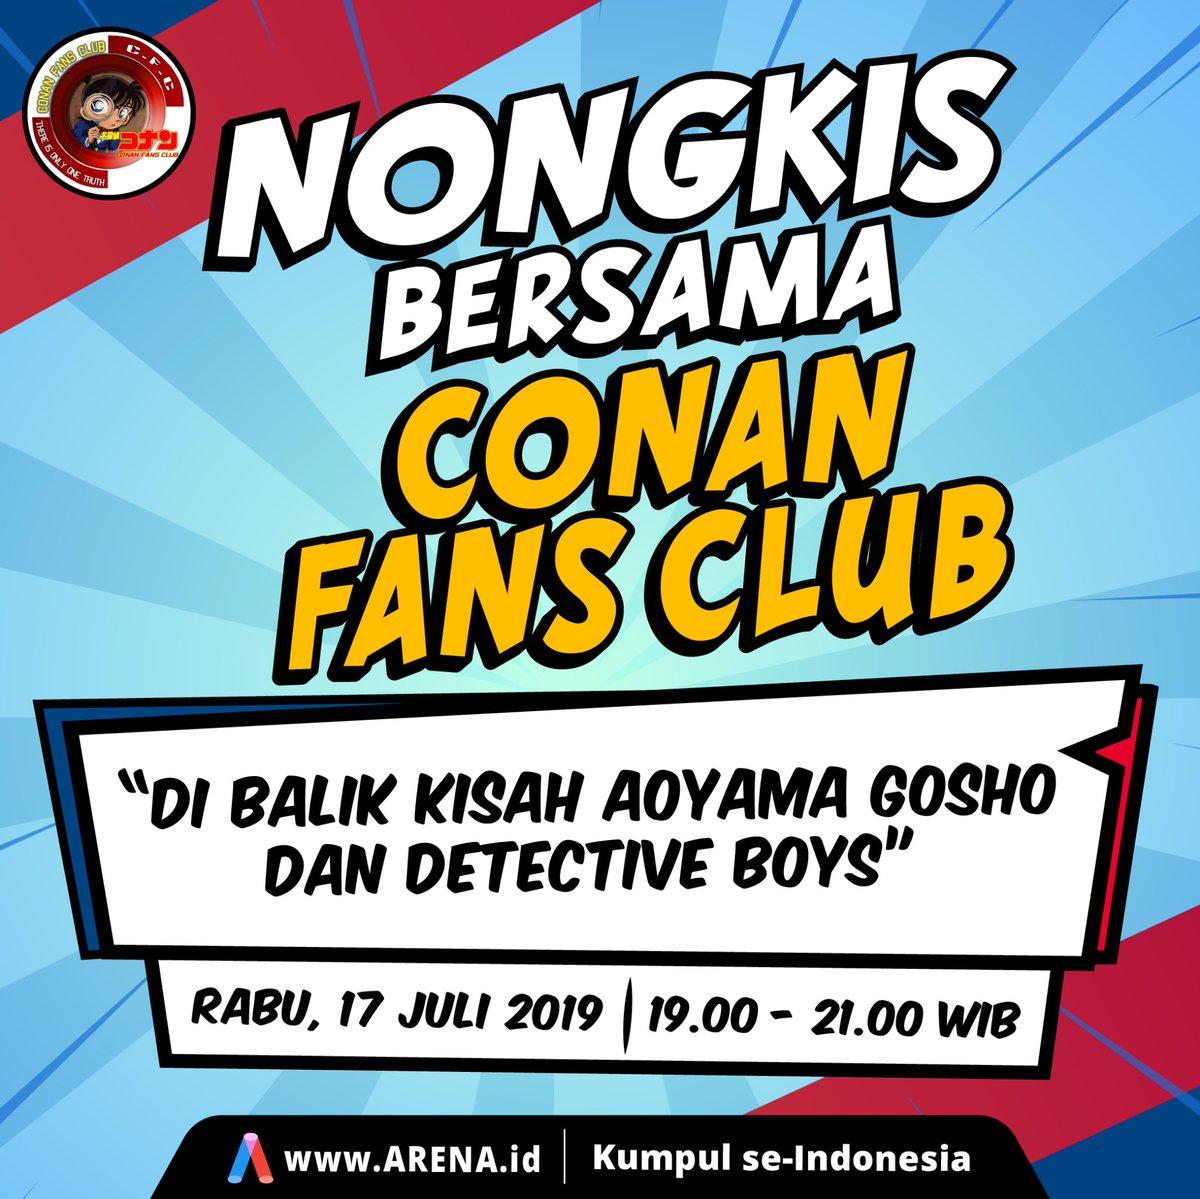 Hai Guys! Buat kalian para pecinta Conan yuk Nongkis bareng sama Conan Fans Club. Saksikan Nongkis bersama CFC setiap Rabu jam 19.00-20.45 hanya di http://Arena.id #conan #detectives #detective_conan #detectiveconanfans #detectiveconananime #detectivestory